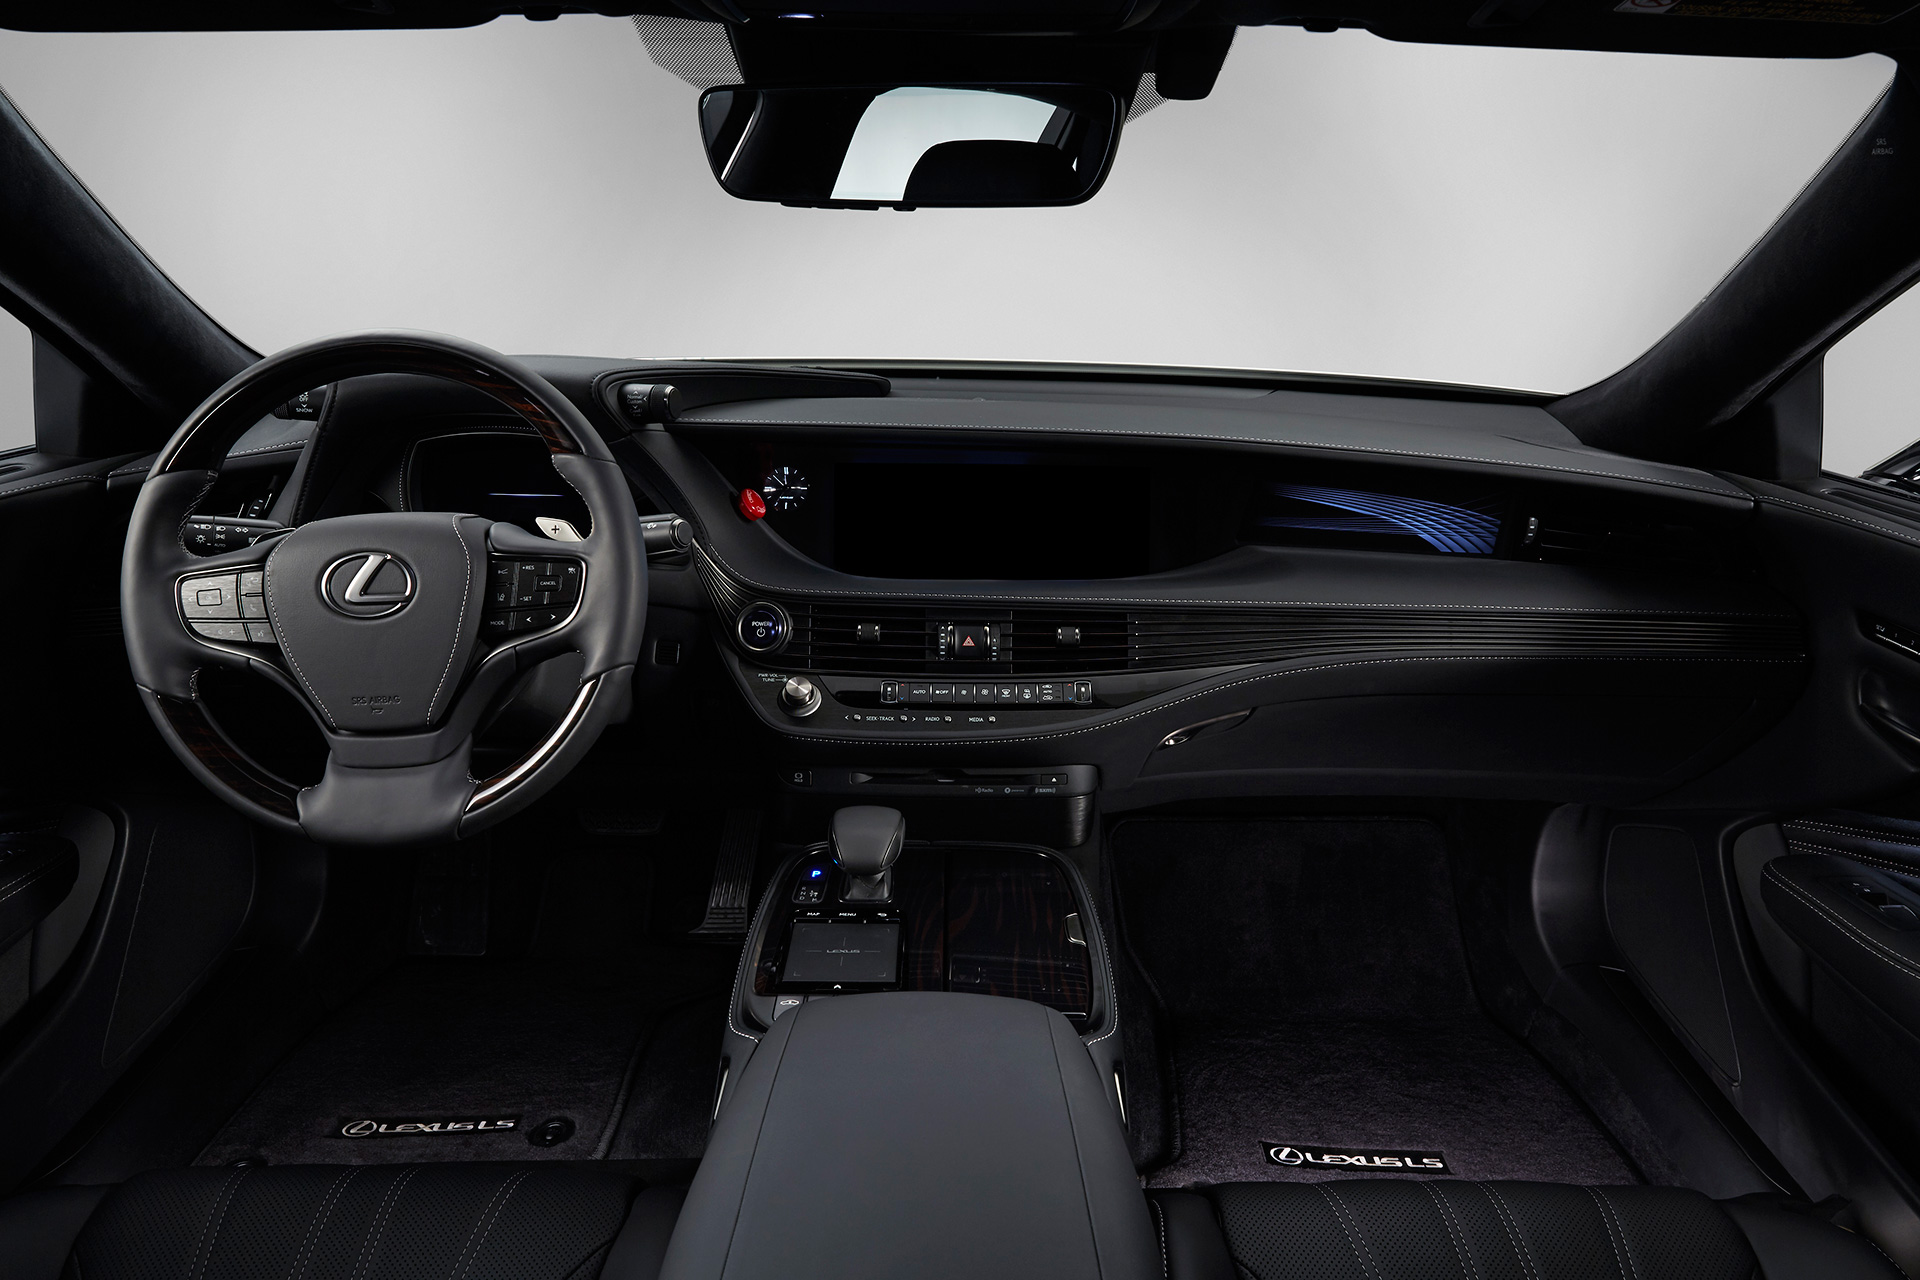 「【CES 2019】新型レクサスLSをベースとした自動運転実験車「TRI-P4」を披露」の8枚目の画像